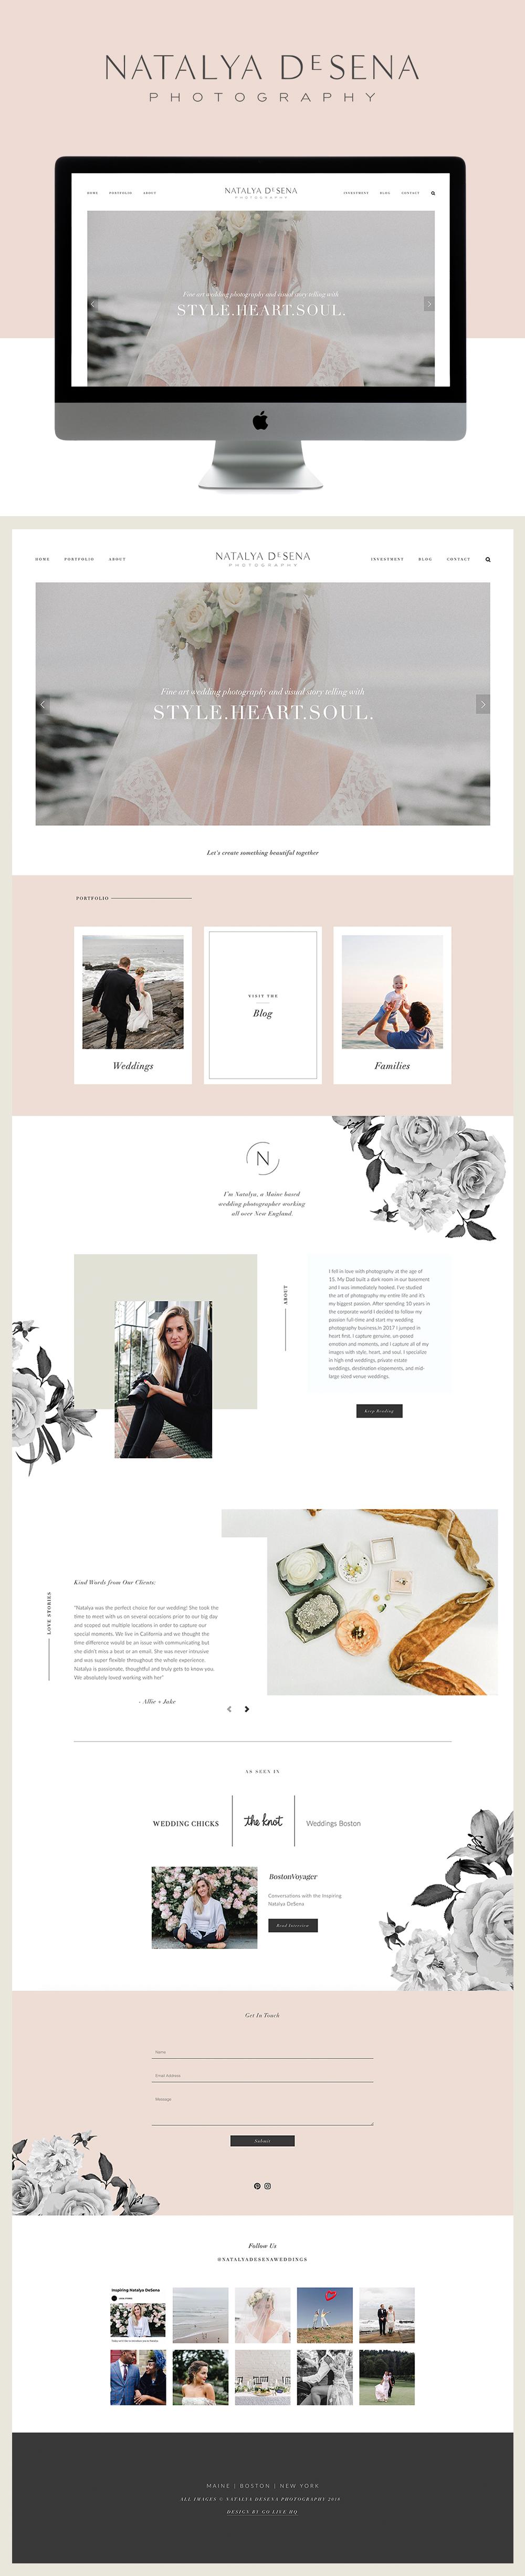 Captivating and soft website design for fine art photography Natalya DeSena | Design By Go Live HQ